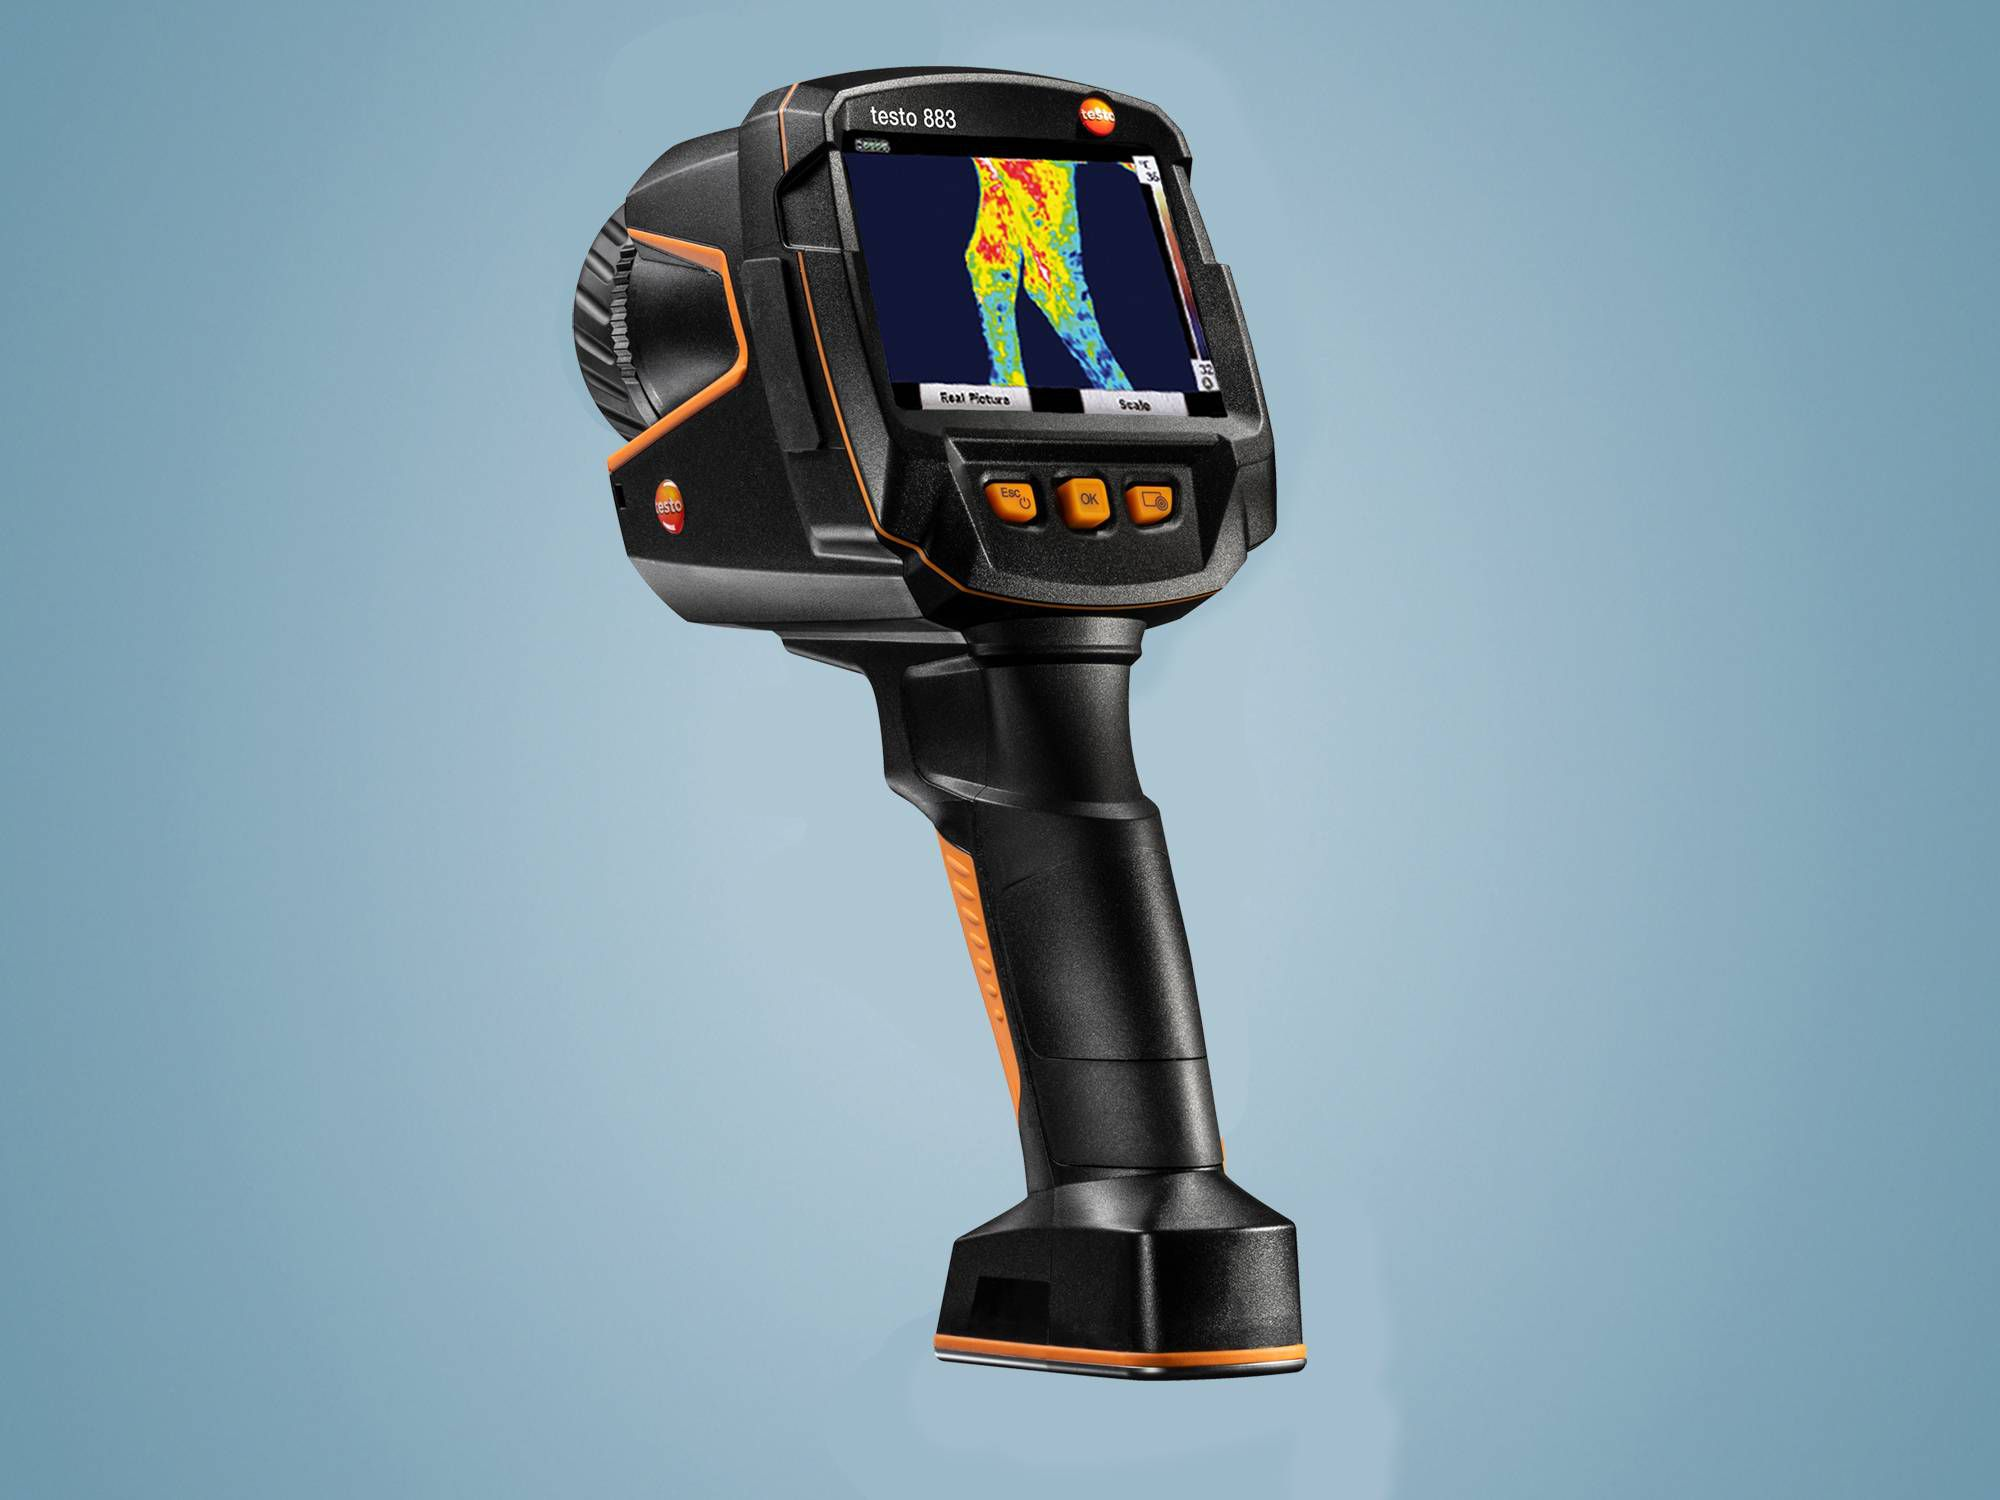 Wärmebildkamera - testo 883